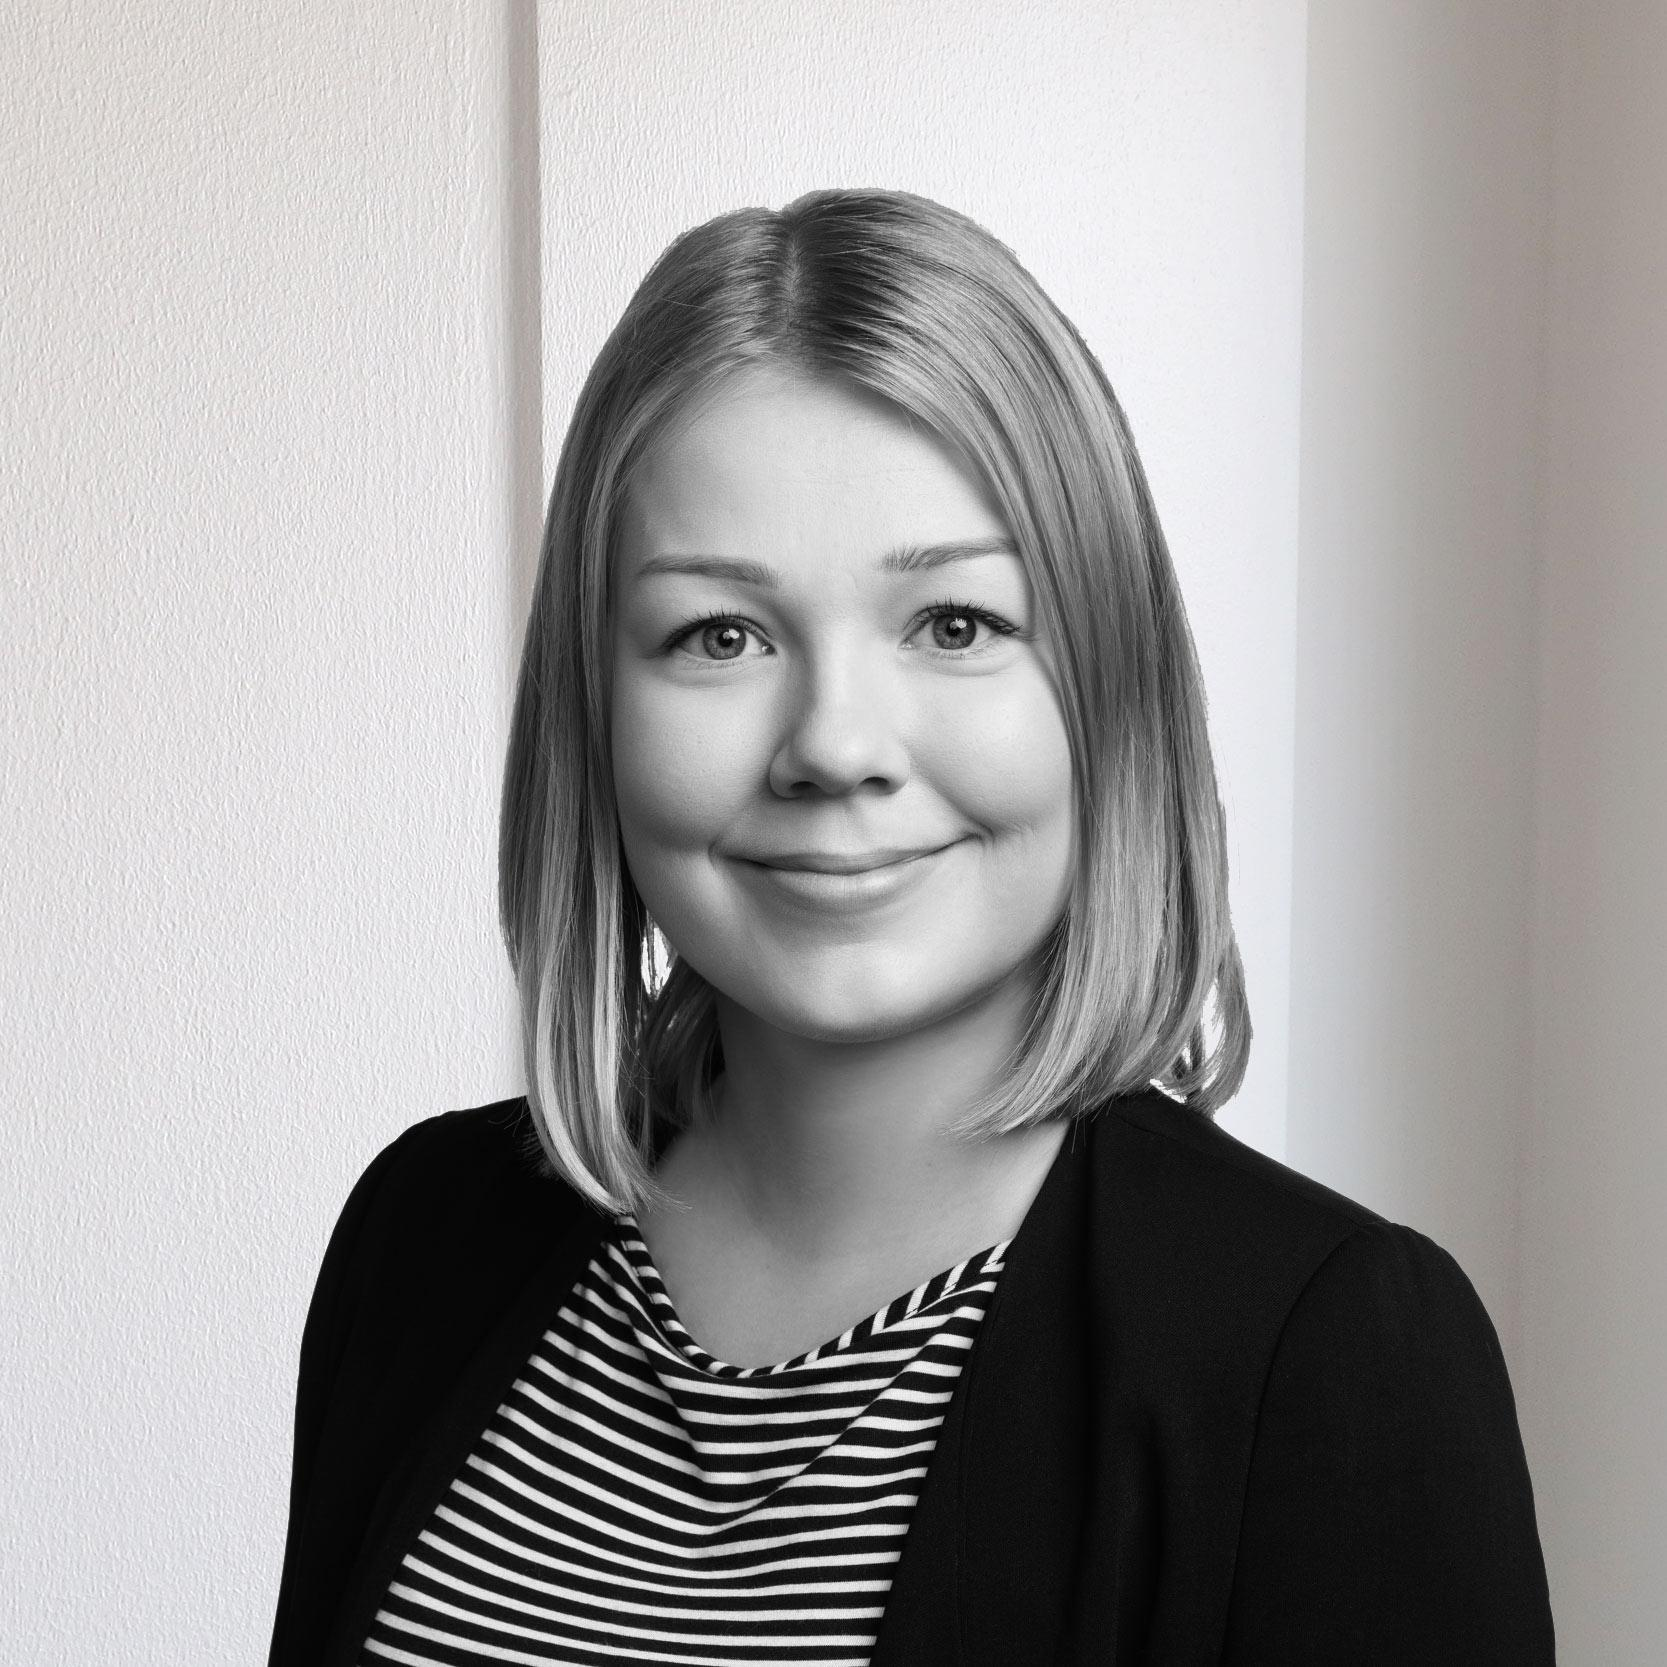 kauppakamari Mari Polvinen blogi